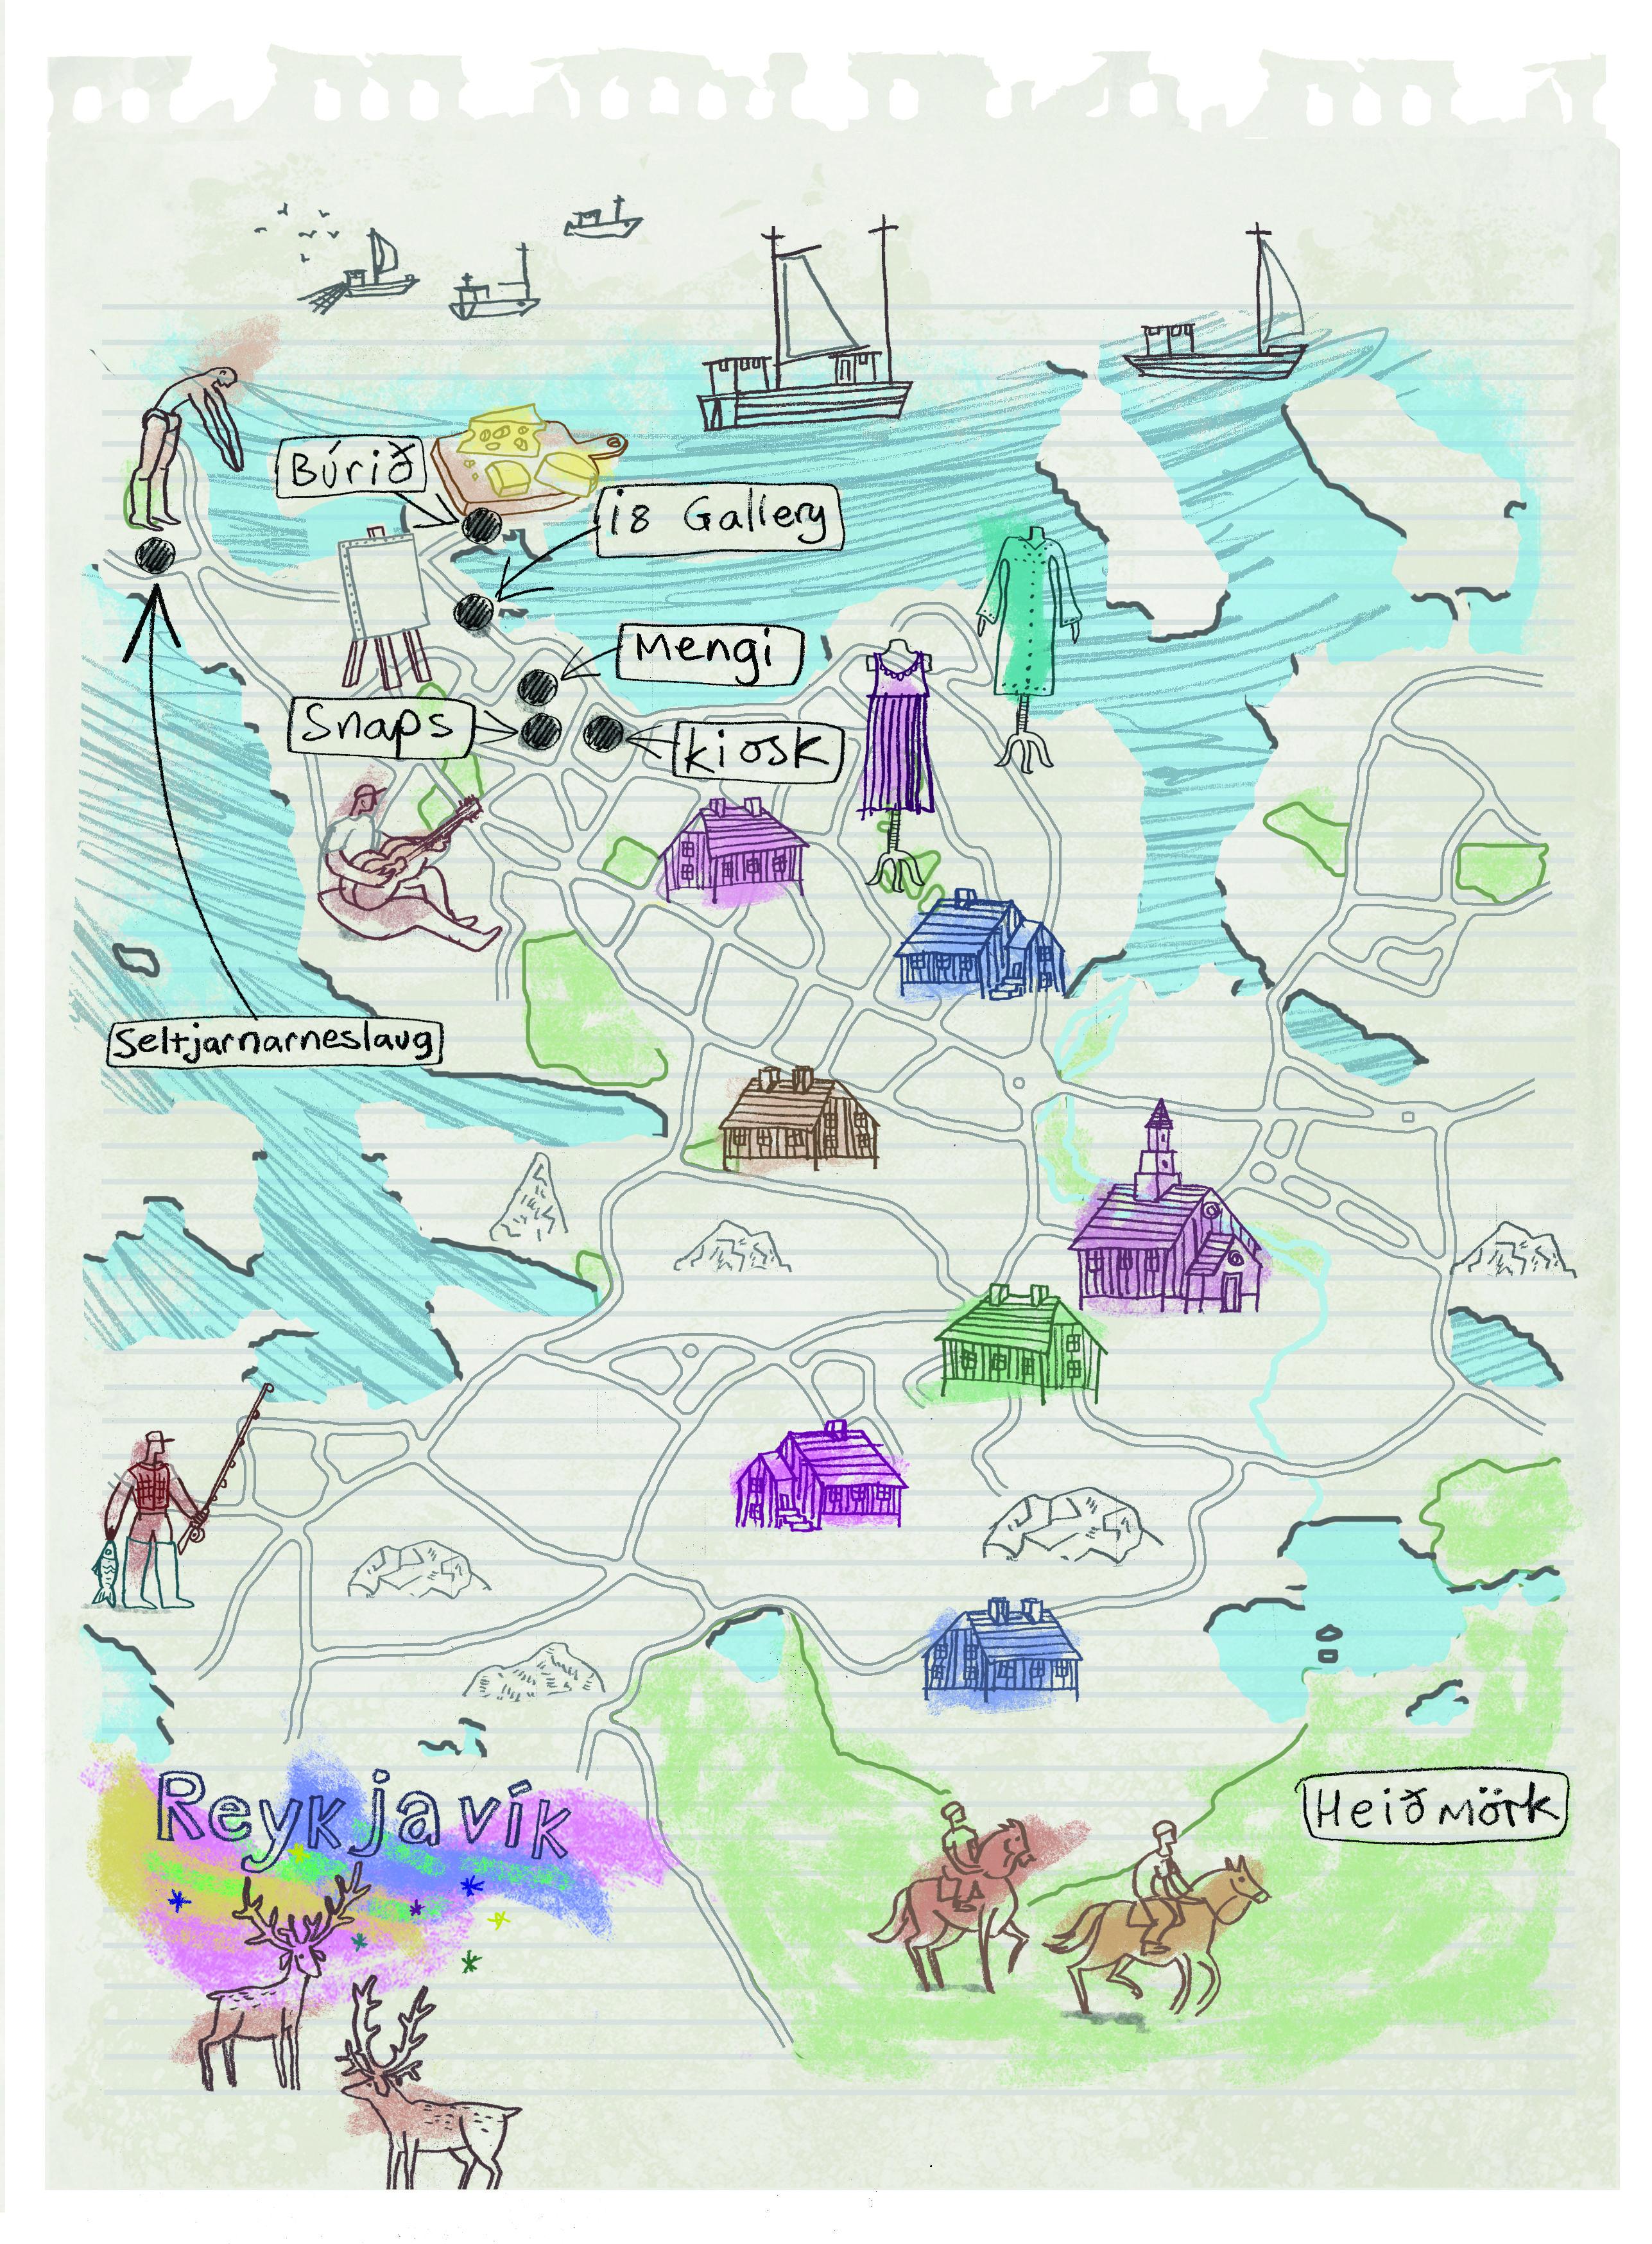 Reykjavik Map By Robert Littleford Maps Reykjavik Map Map